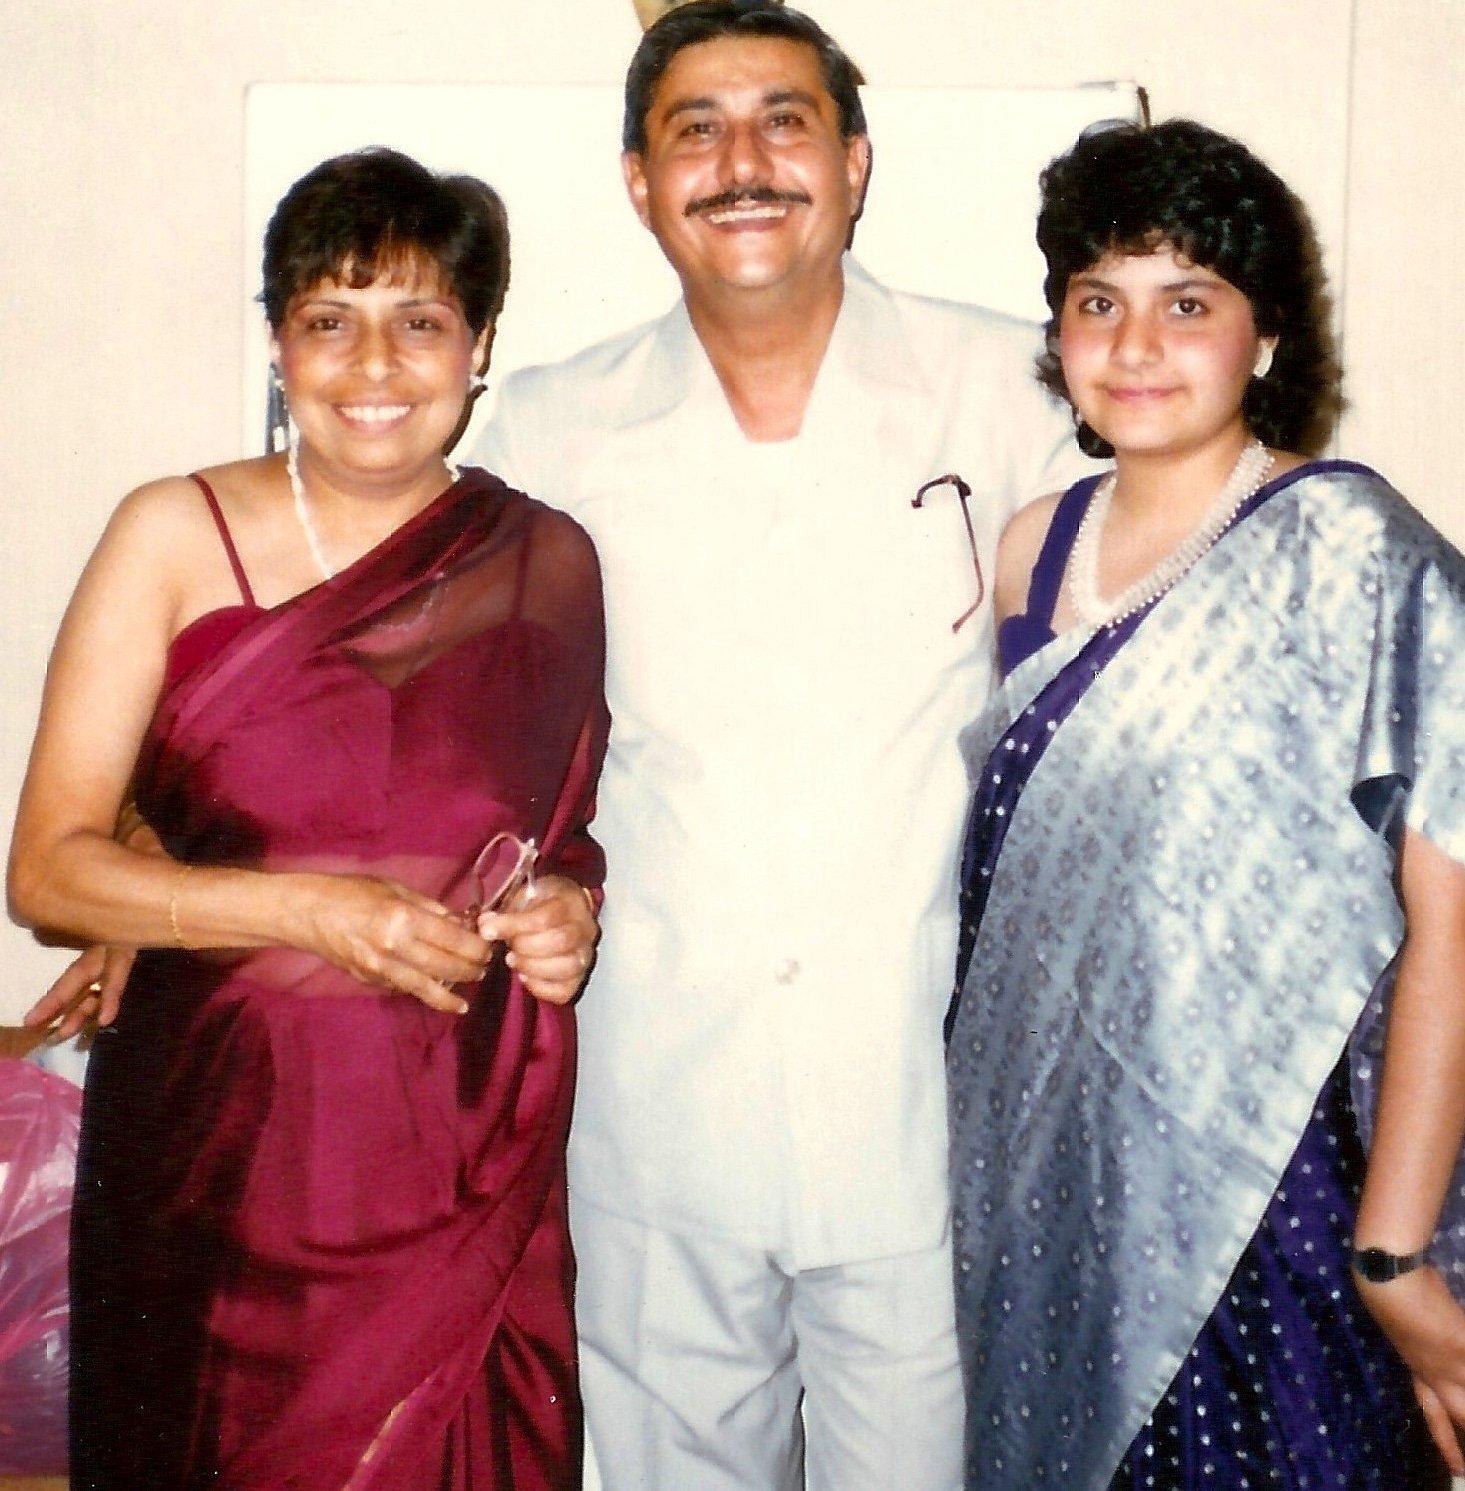 Nina Wadia with her mum Homai and dad Minoo in